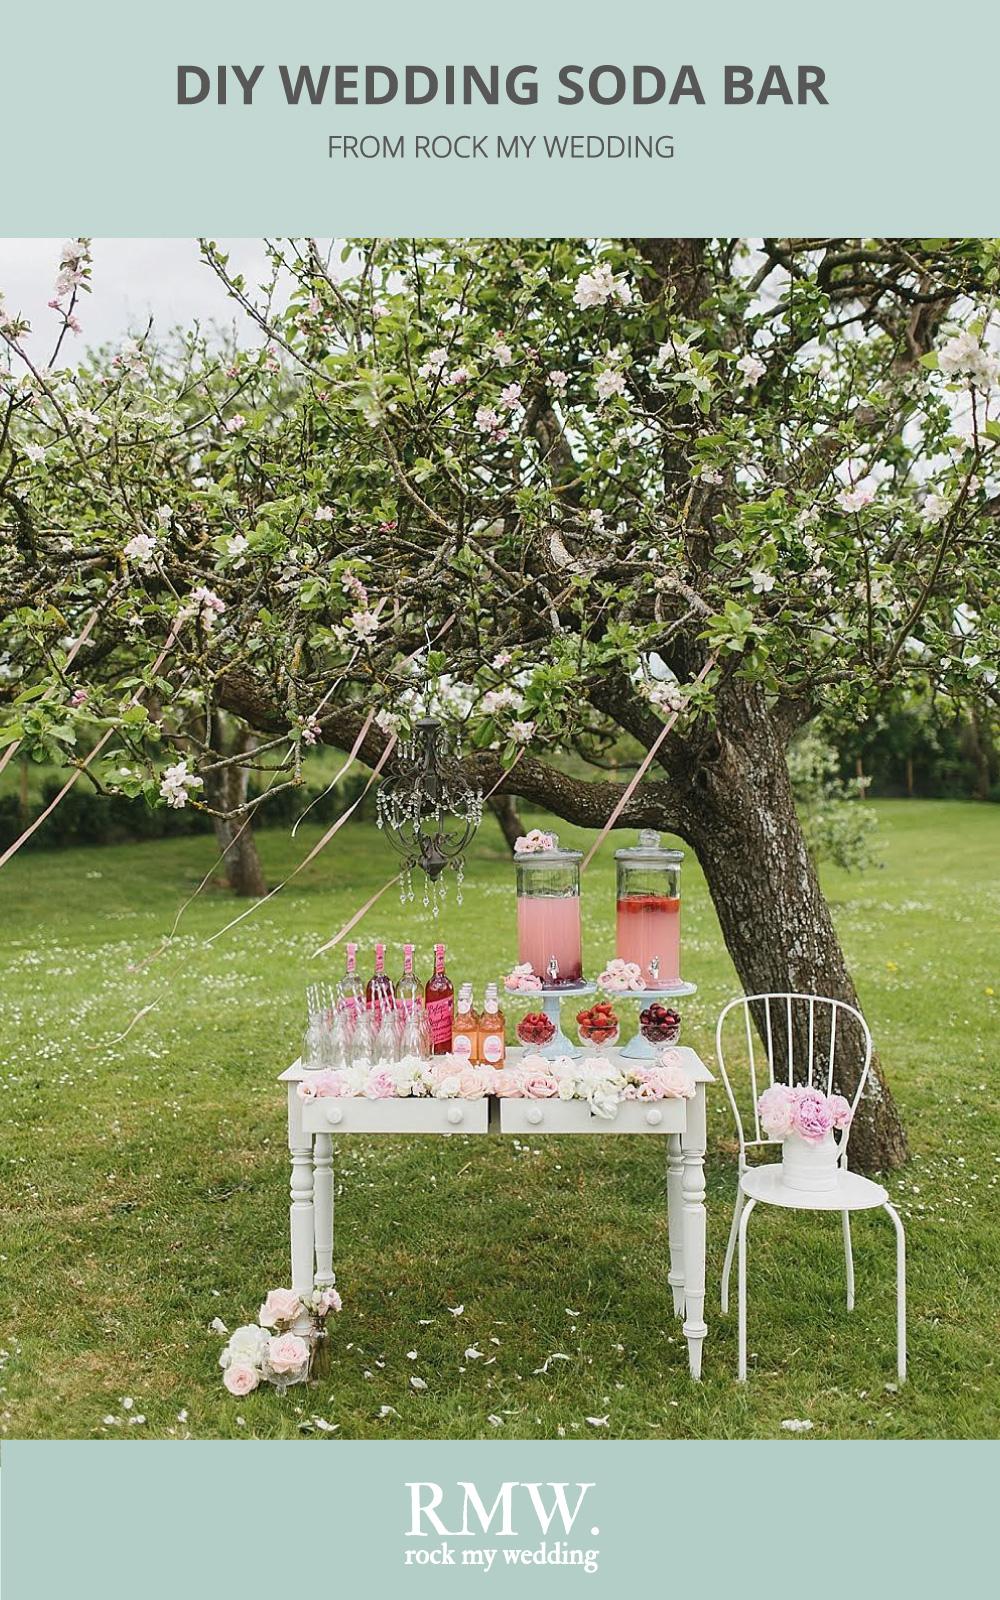 Wedding DIY Project // Pink Floral Soda Bar // DIY Bar Set Up For Wedding